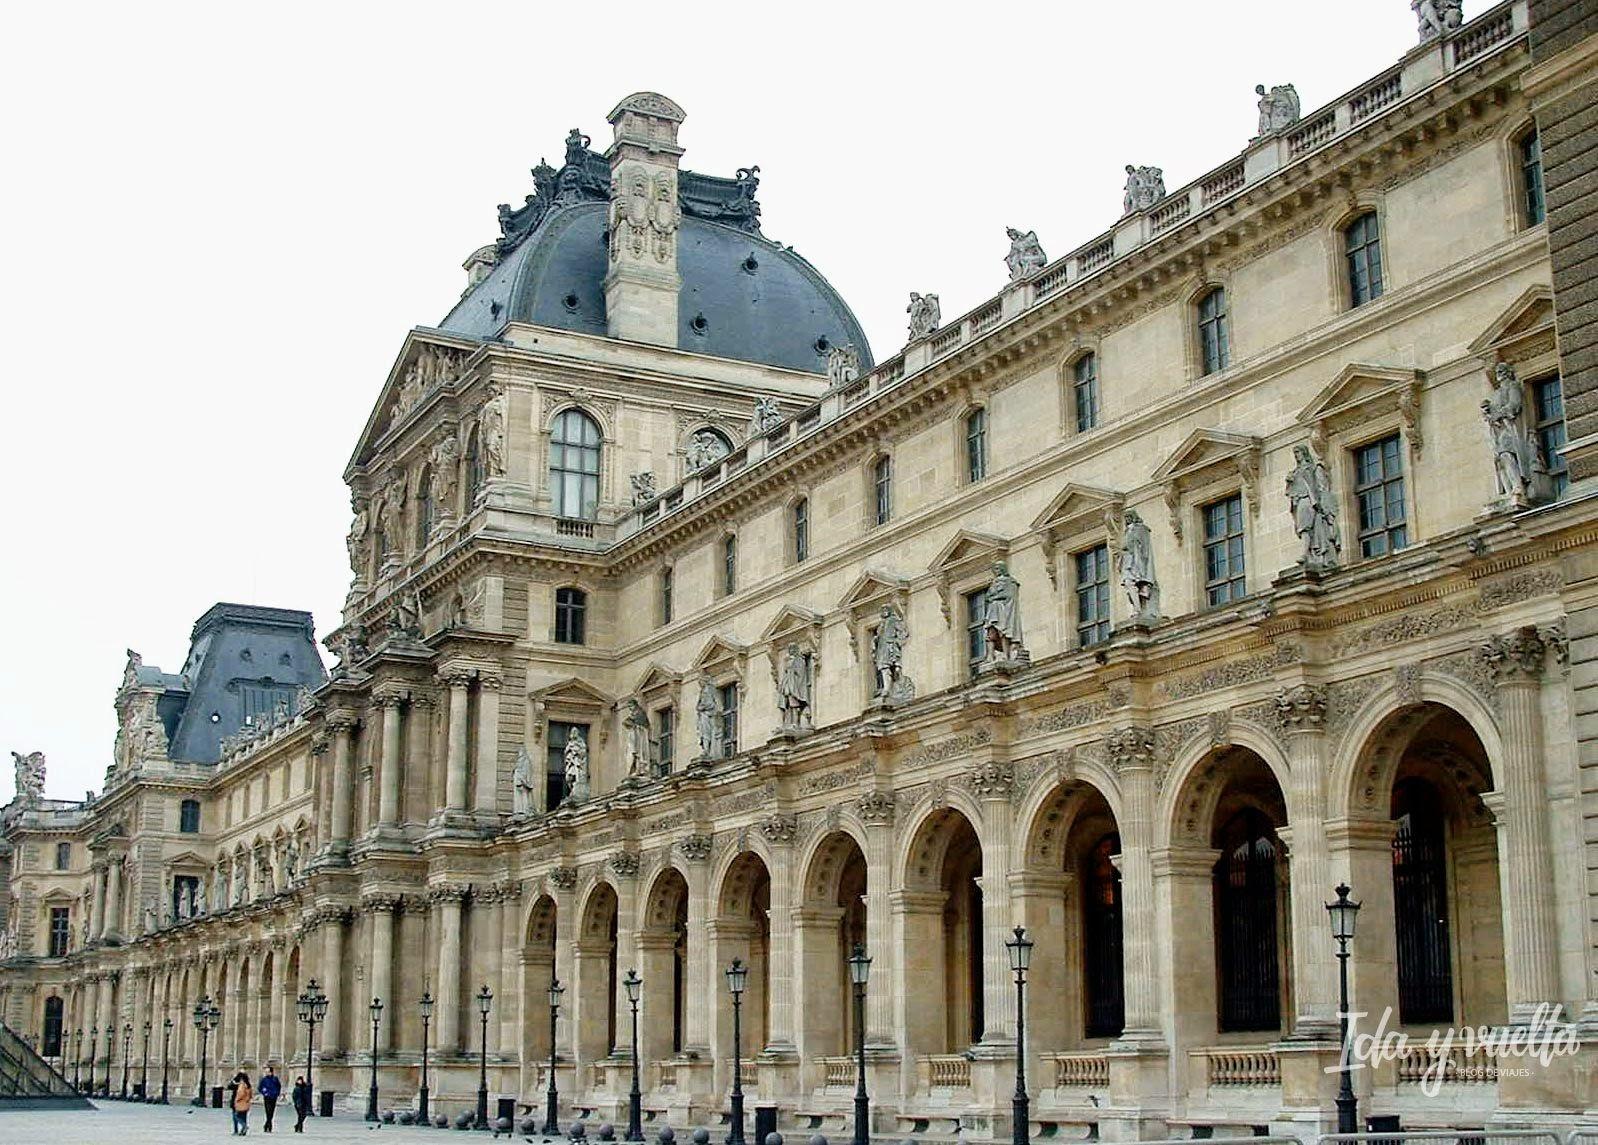 Palacio del Louvre